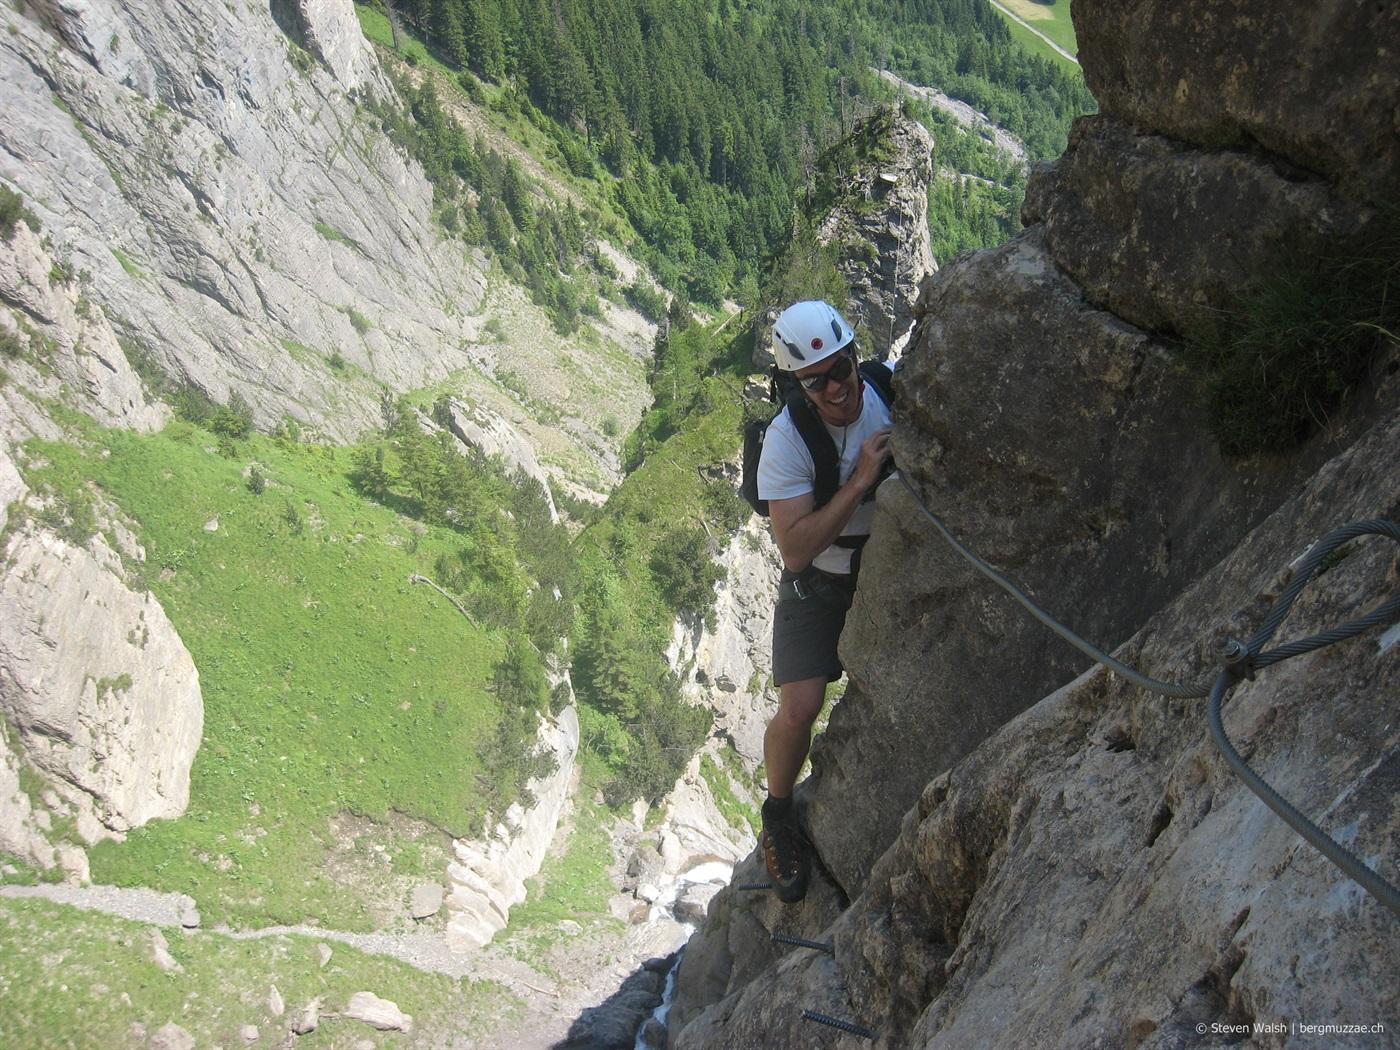 Klettersteig Allmenalp : Allmenalp klettersteig m u bergmuzzae